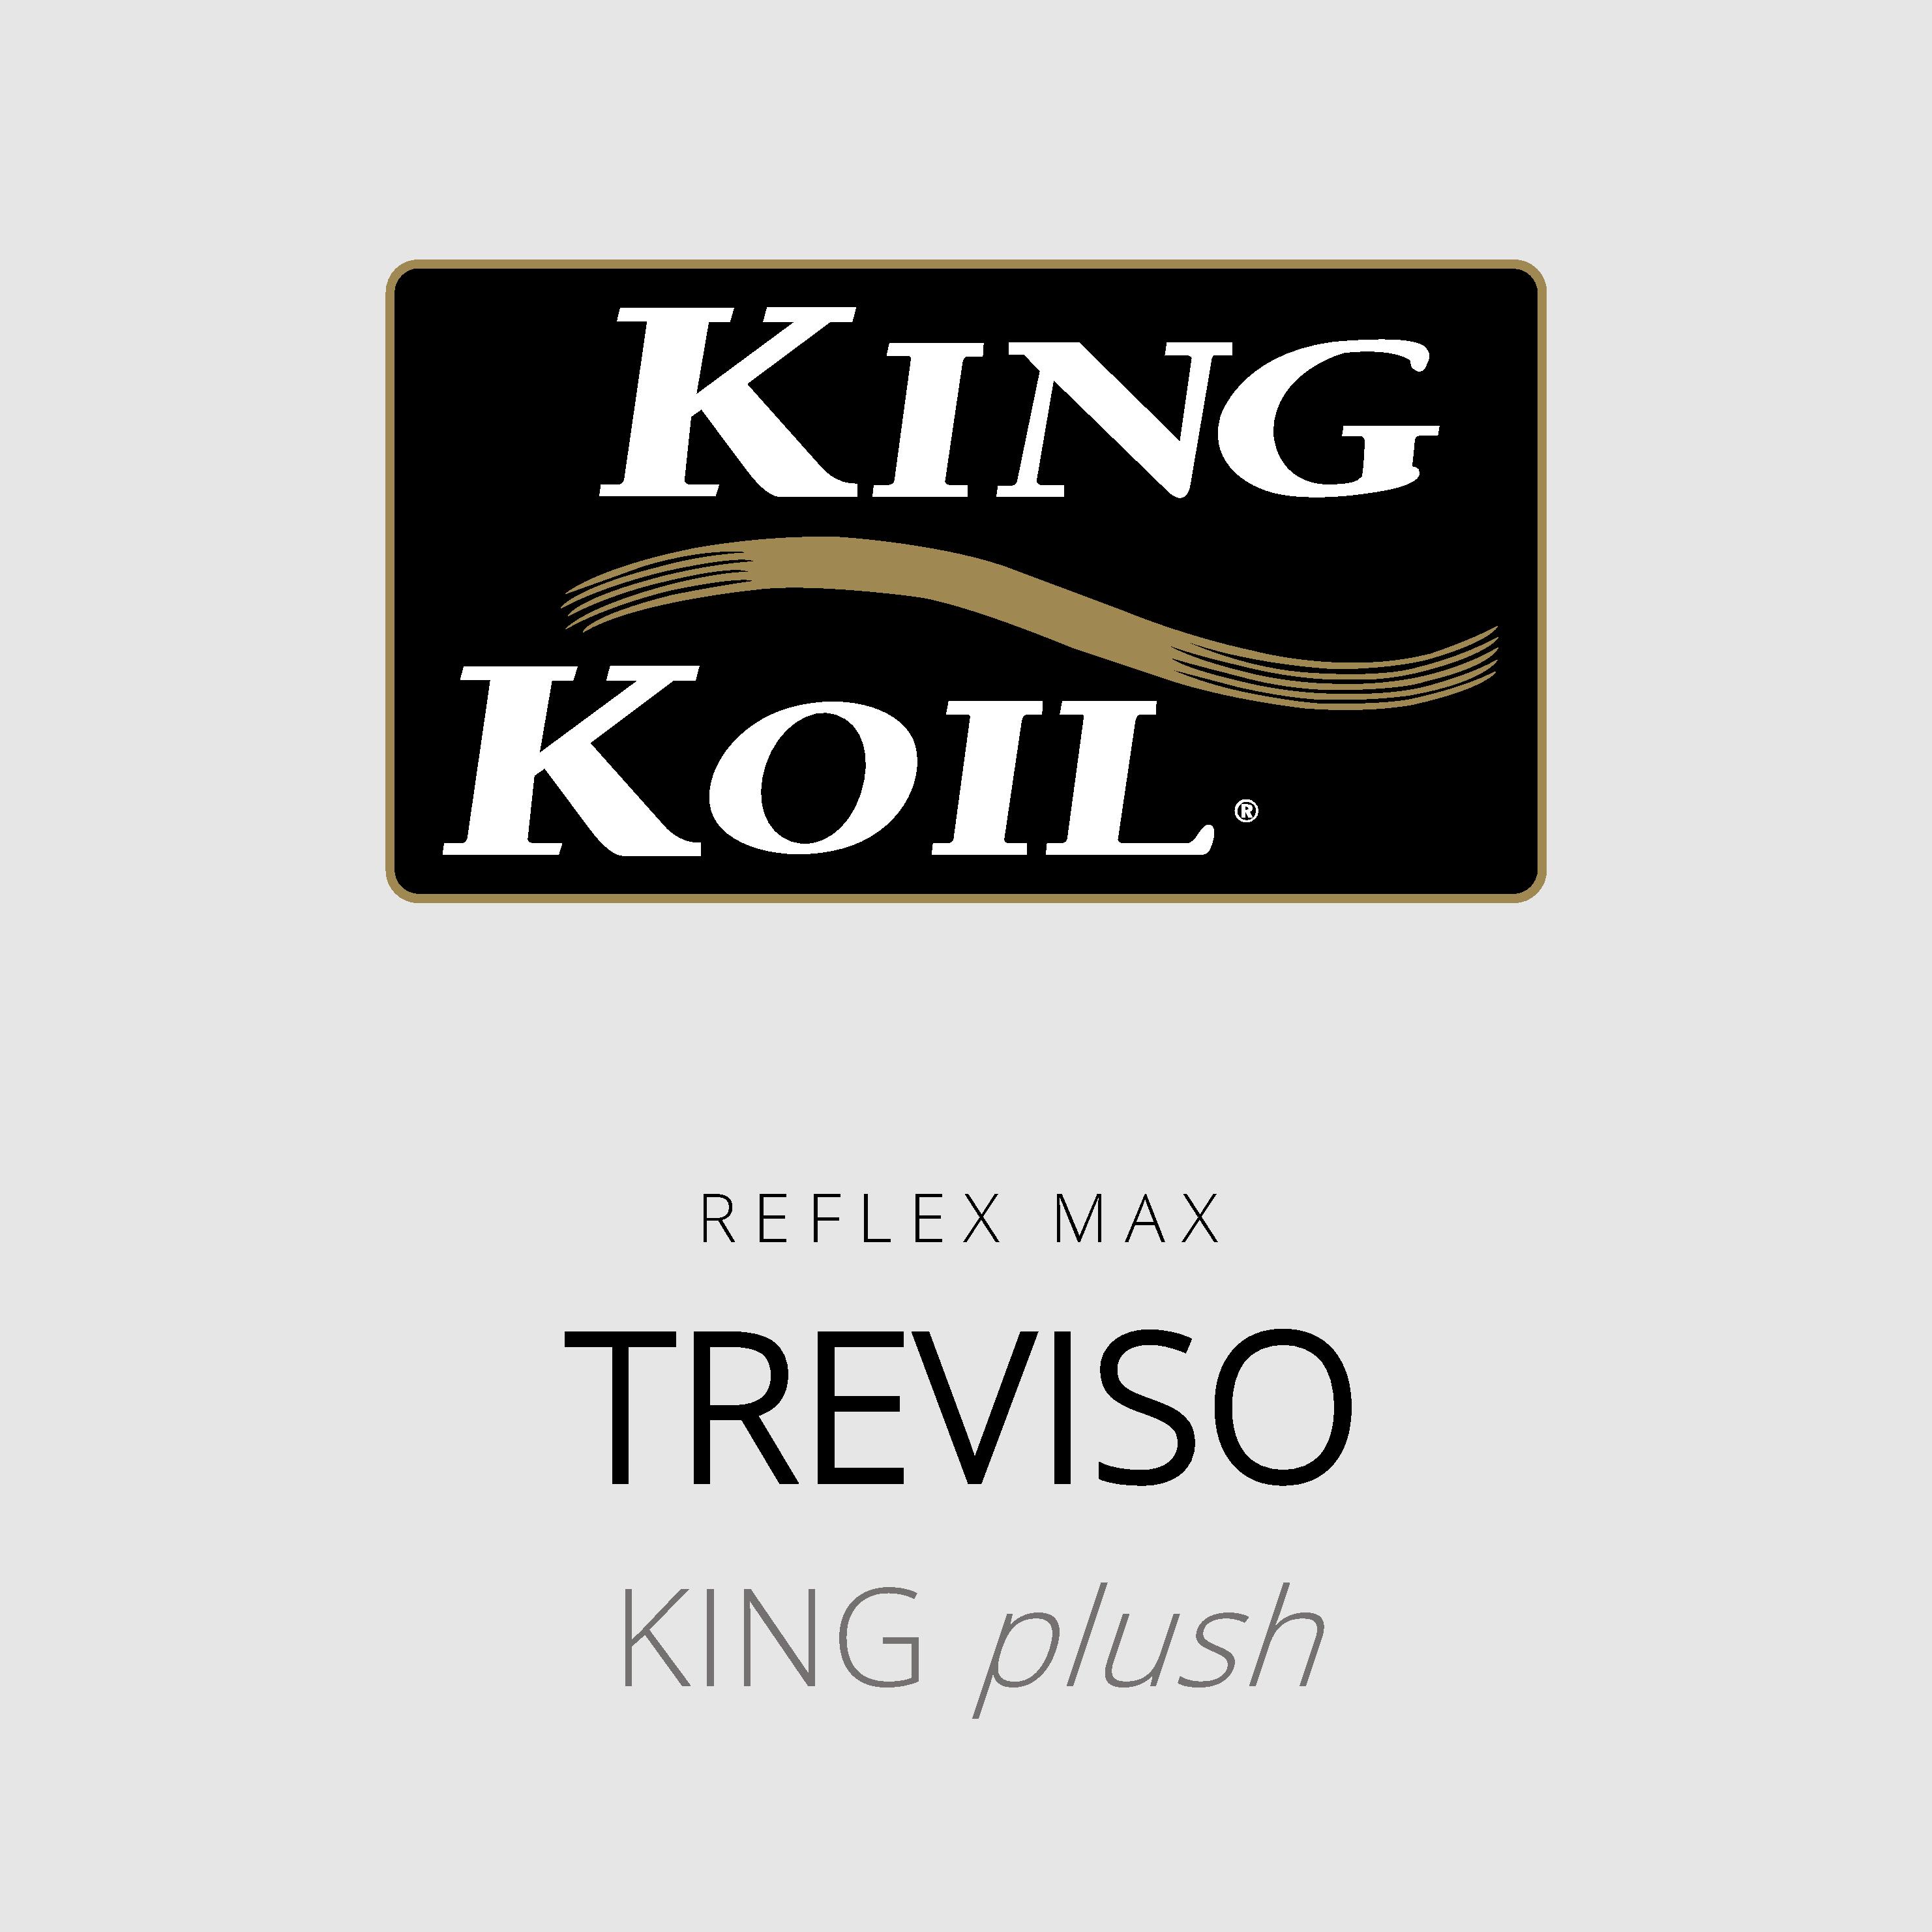 King Koil – Treviso – Reflex Max – King Plush Mattress